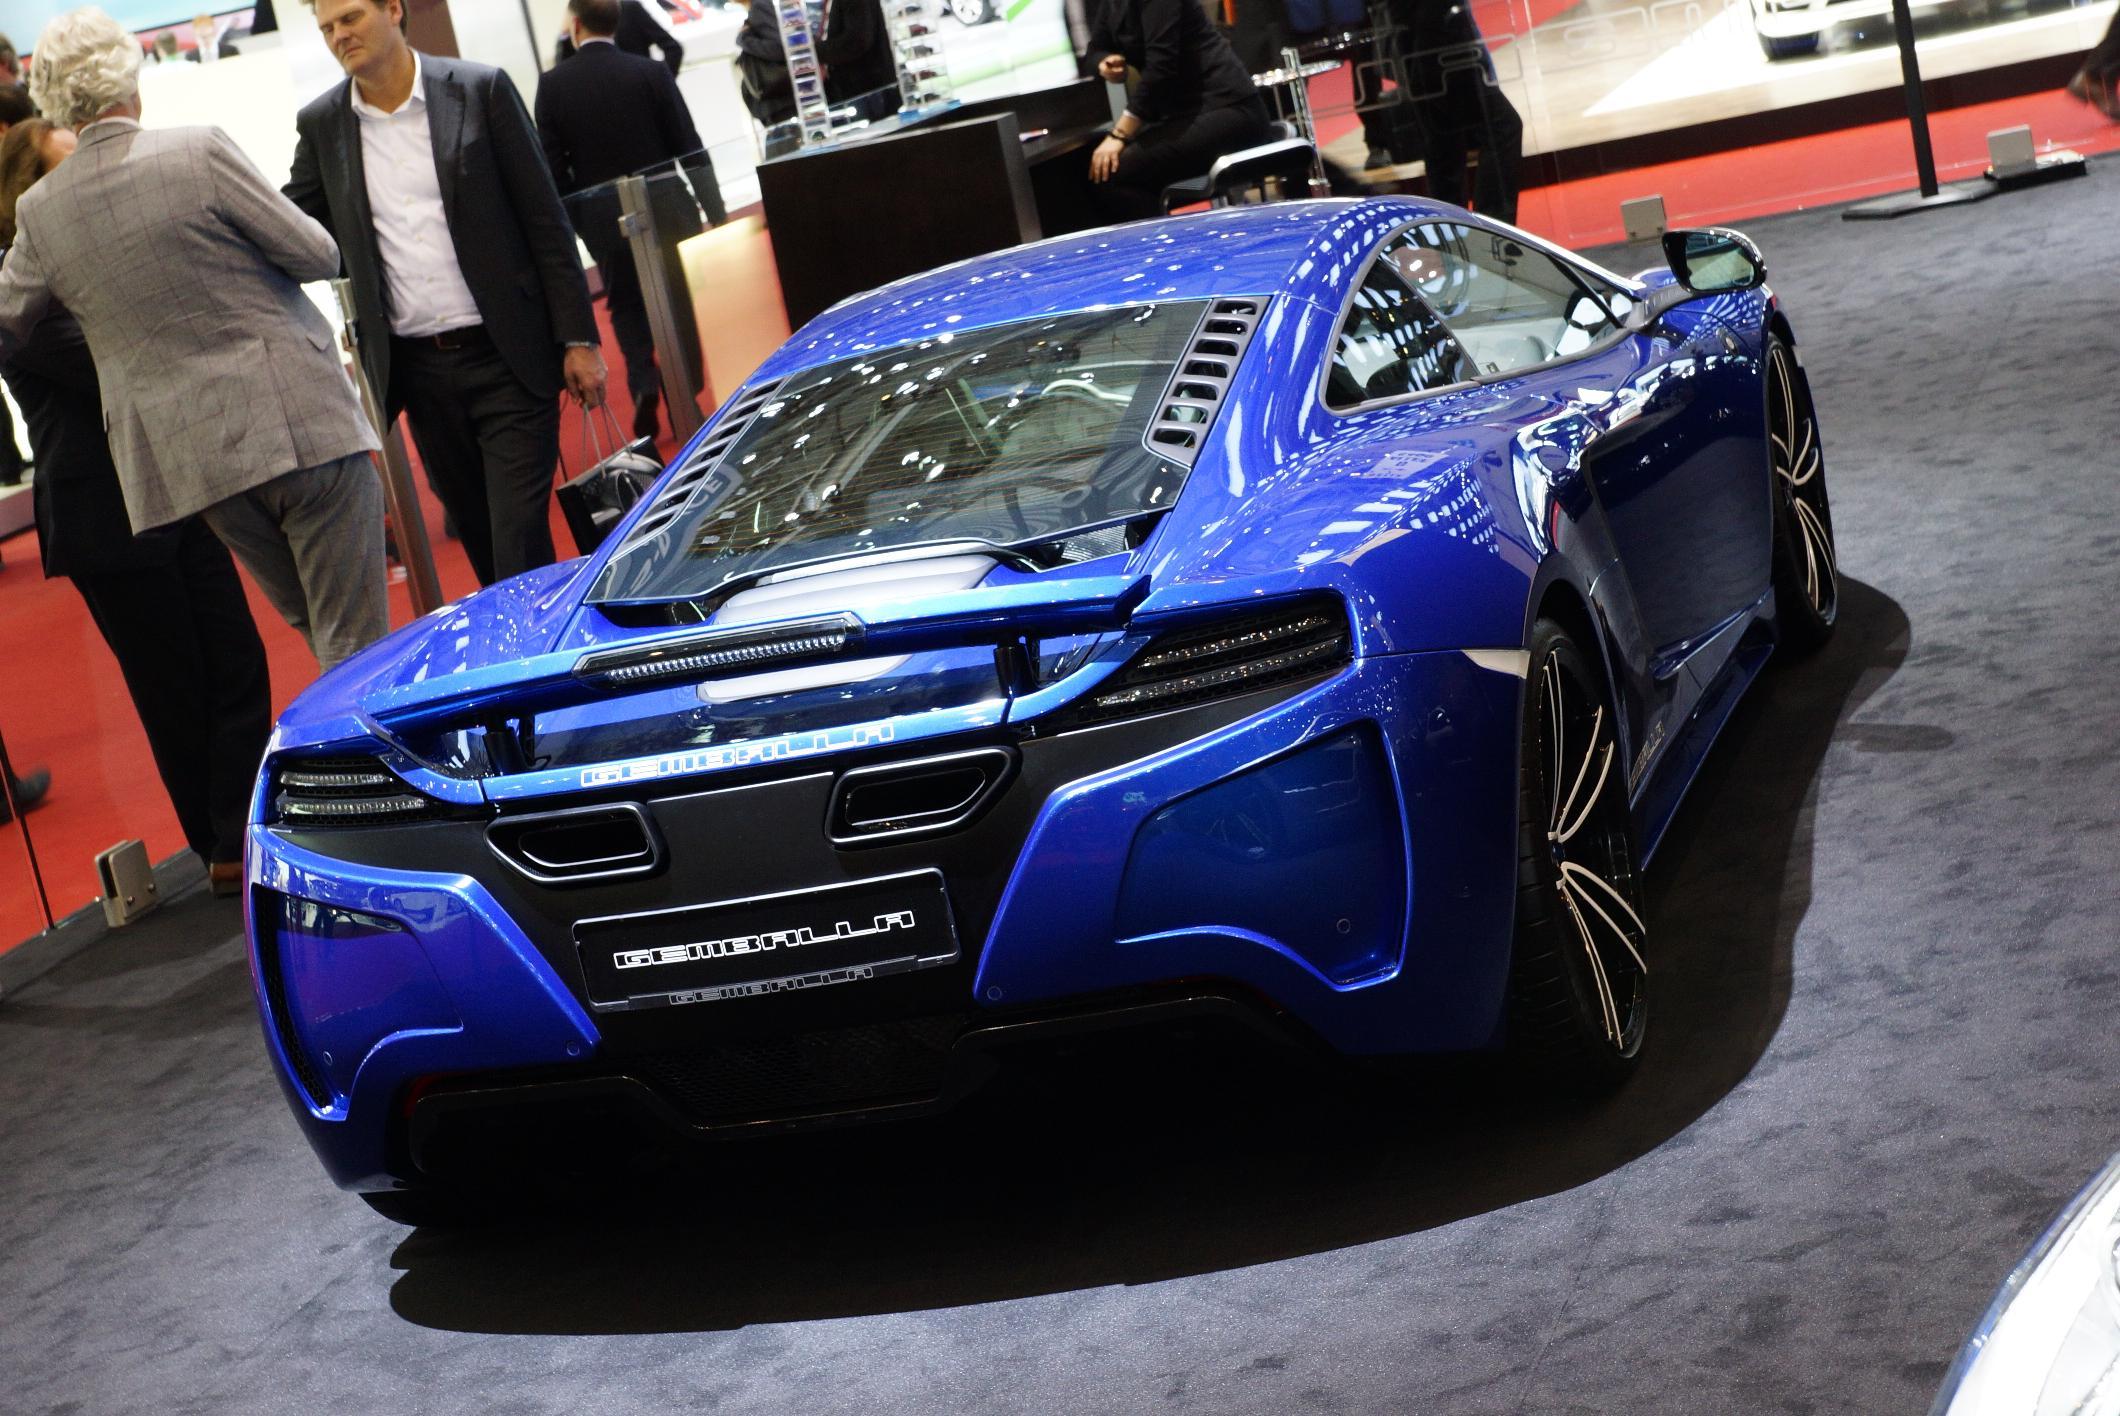 Gemballa GT McLaren MP4-12C Geneva 2012